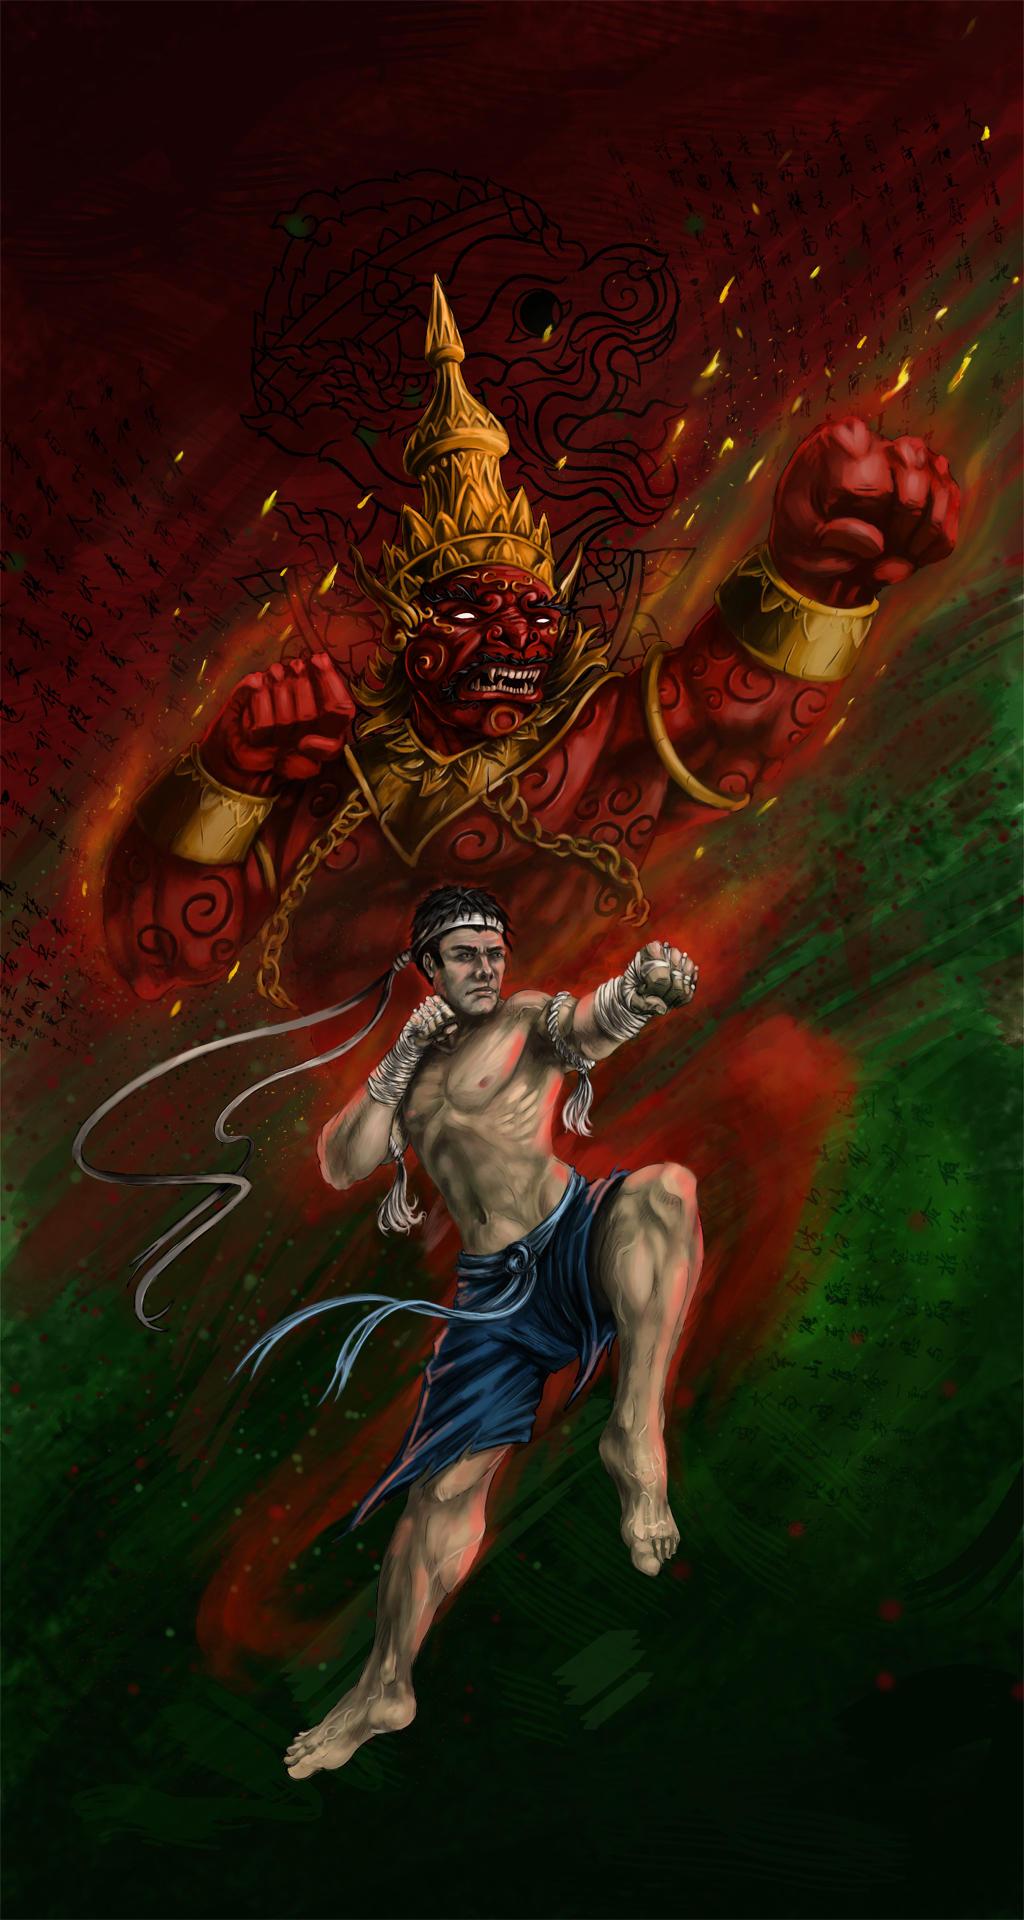 Muay-thai by InsaneInfernO